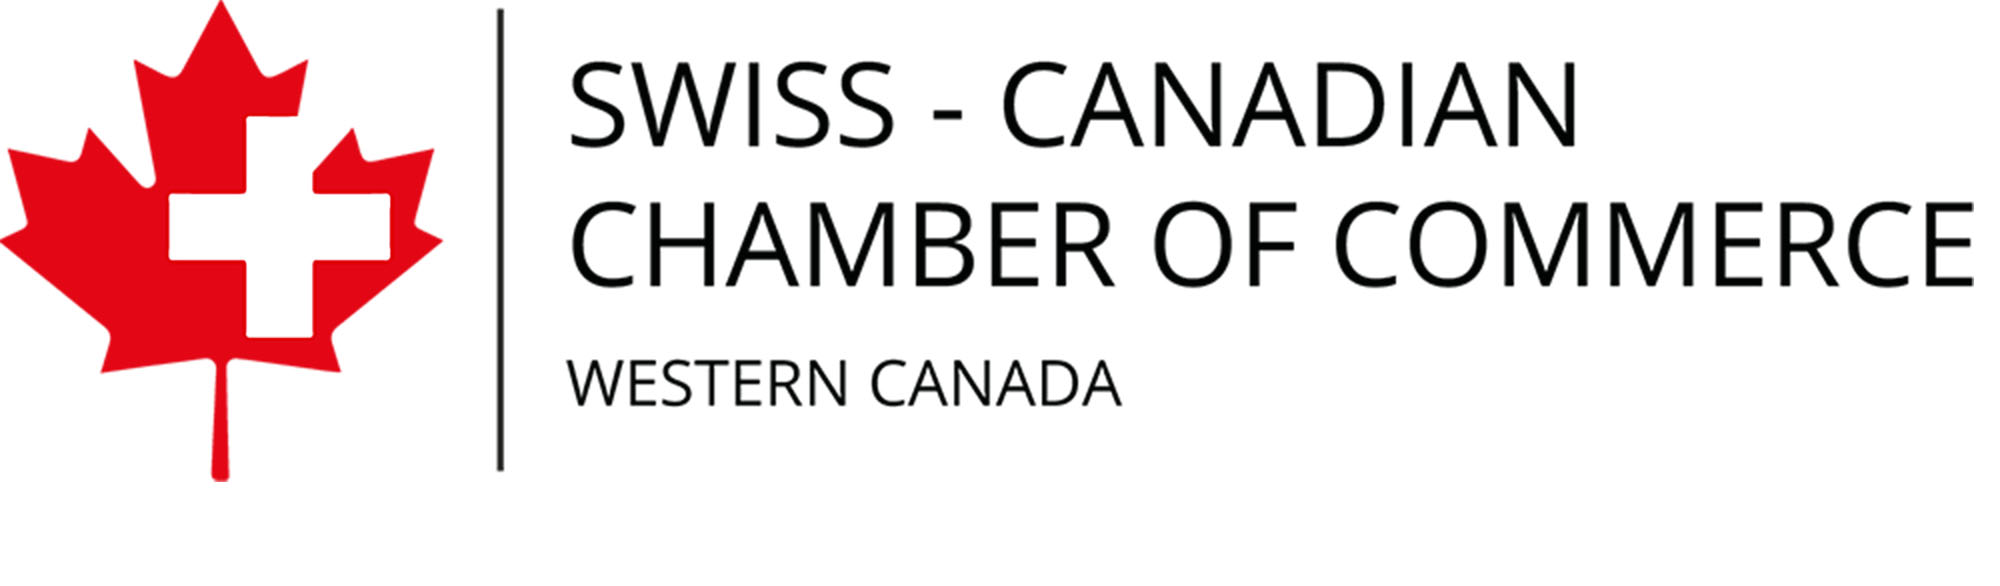 Swiss Canadian Chamber of Commerce.jpg